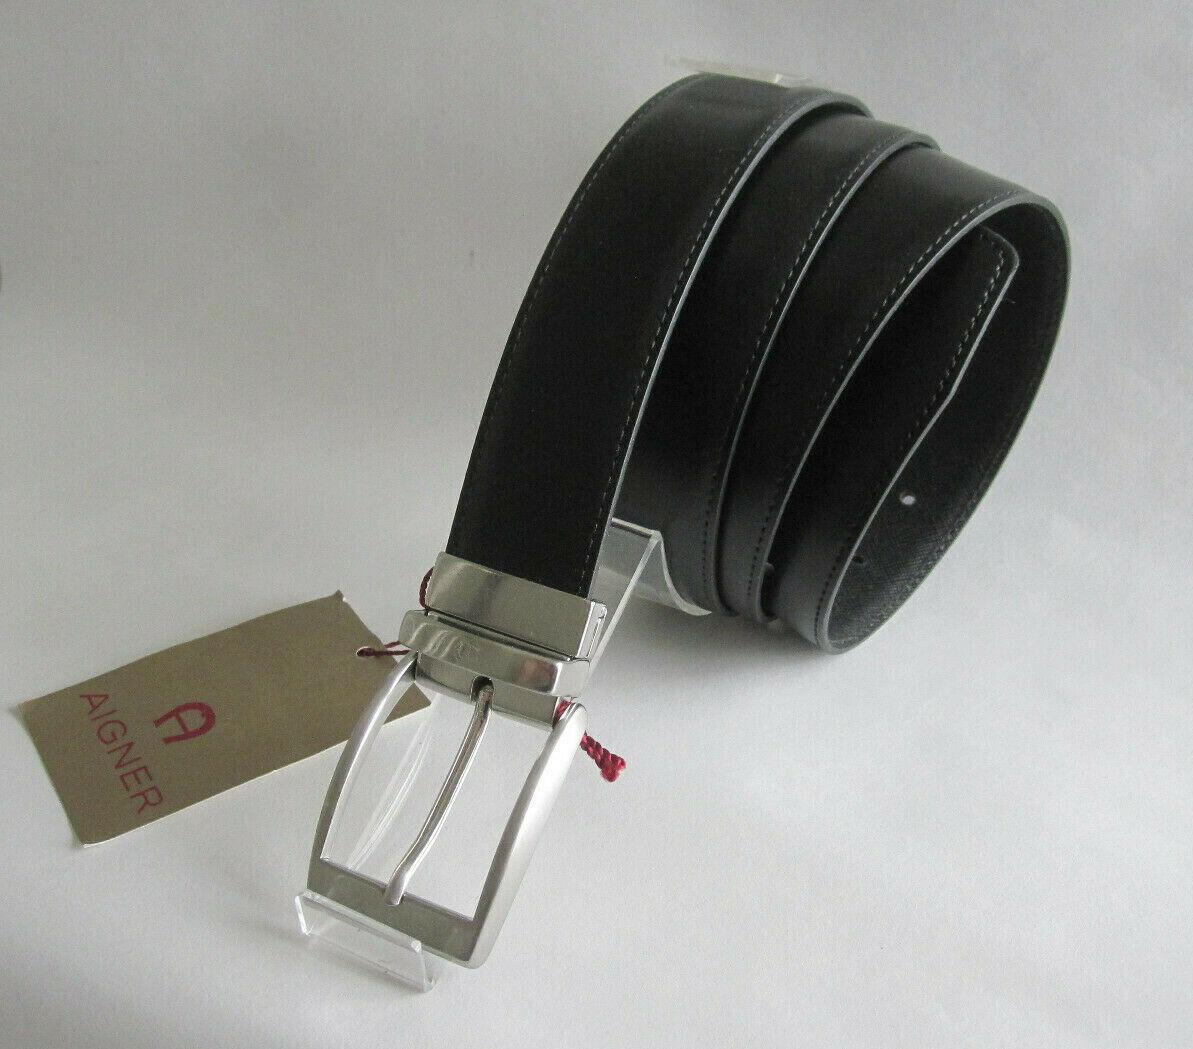 Aigner-Mens Leather Belt - 3,5 cm